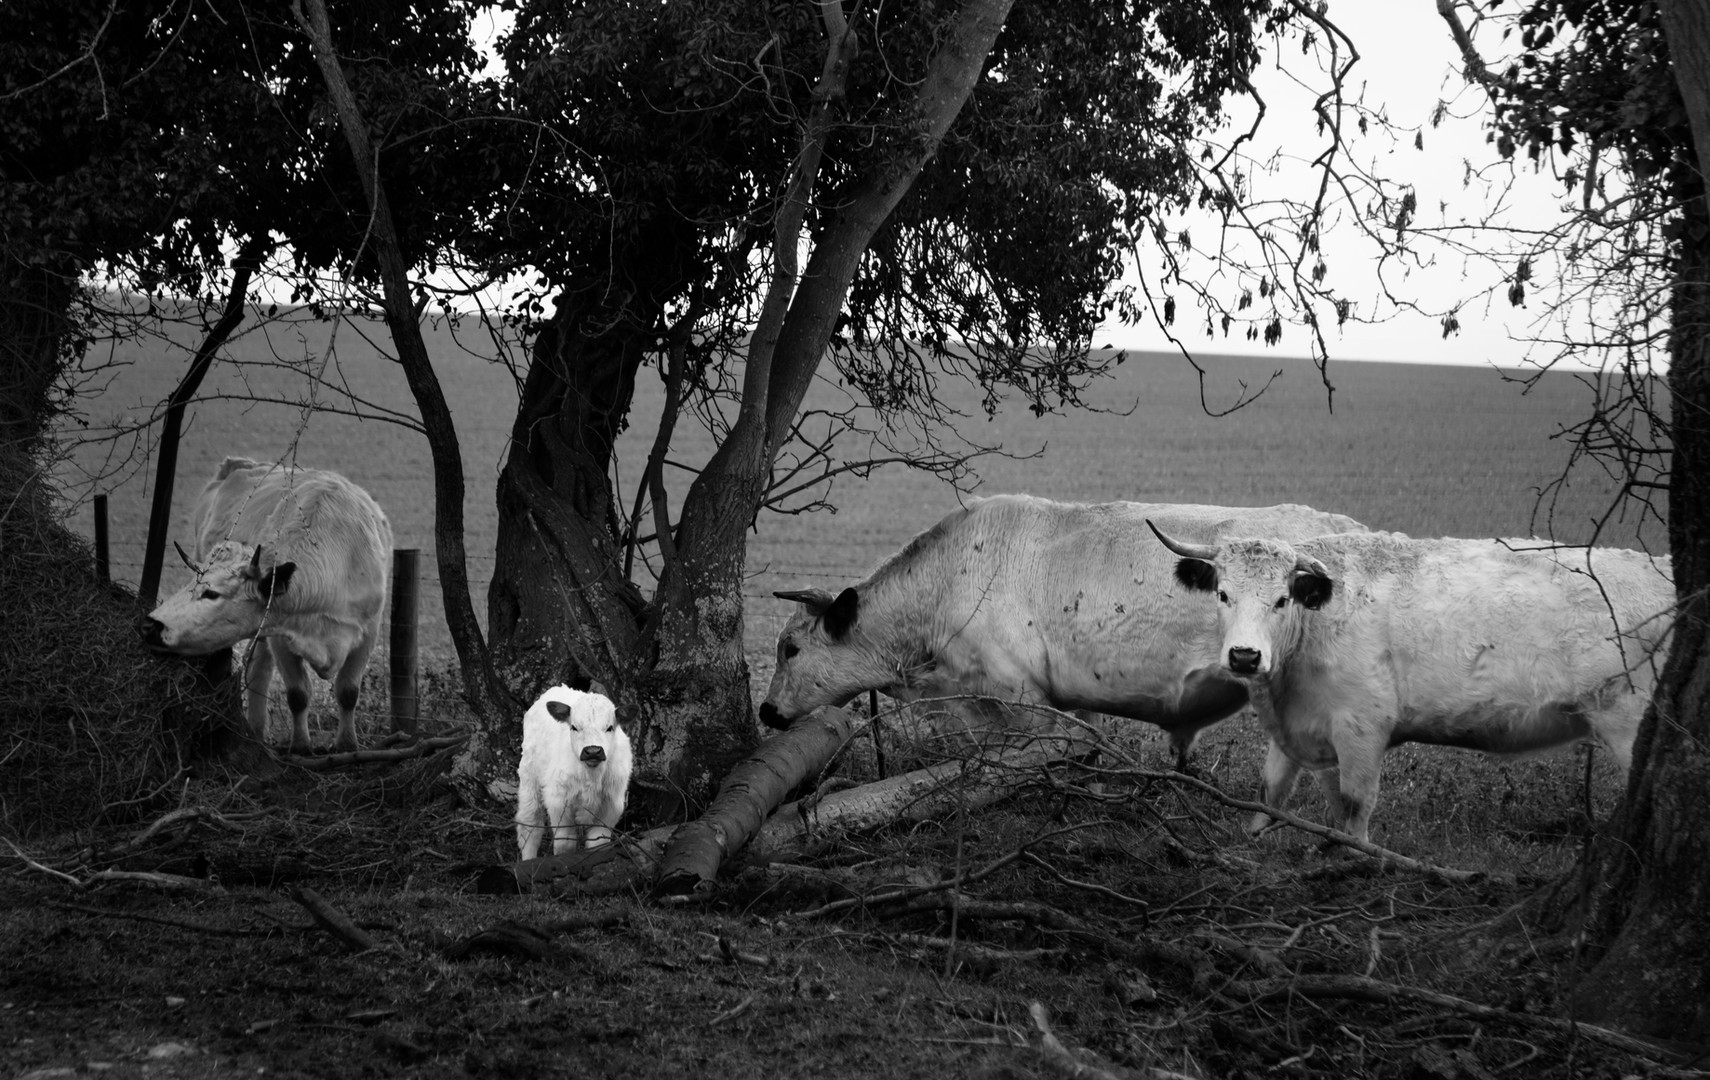 Three Cows and a Calf